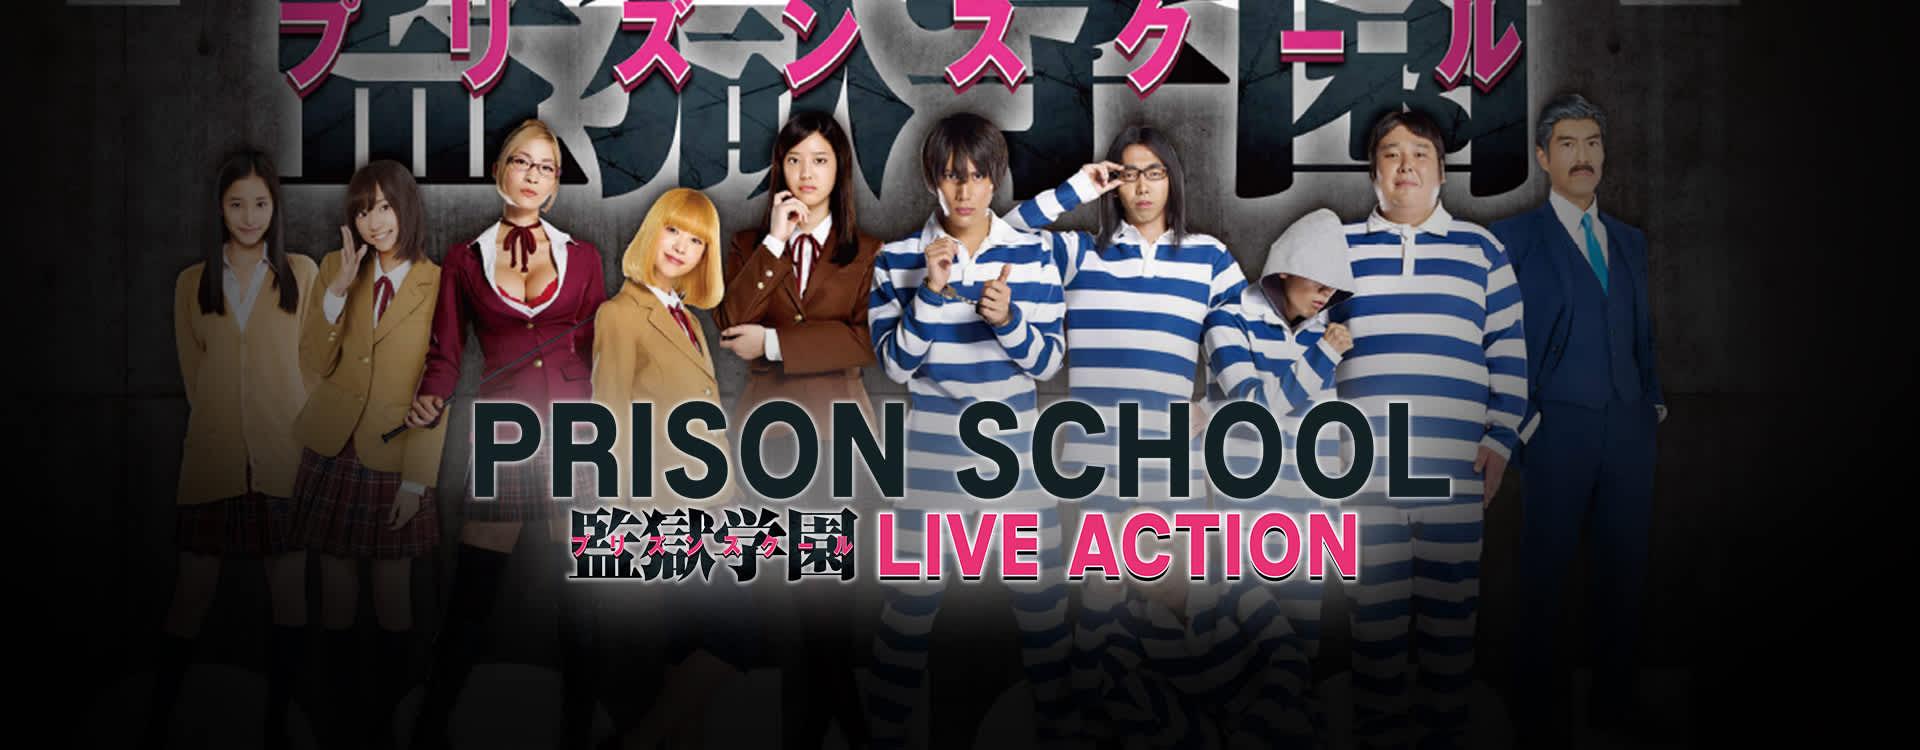 Watch Prison School (Live Action) Episodes Sub | Comedy